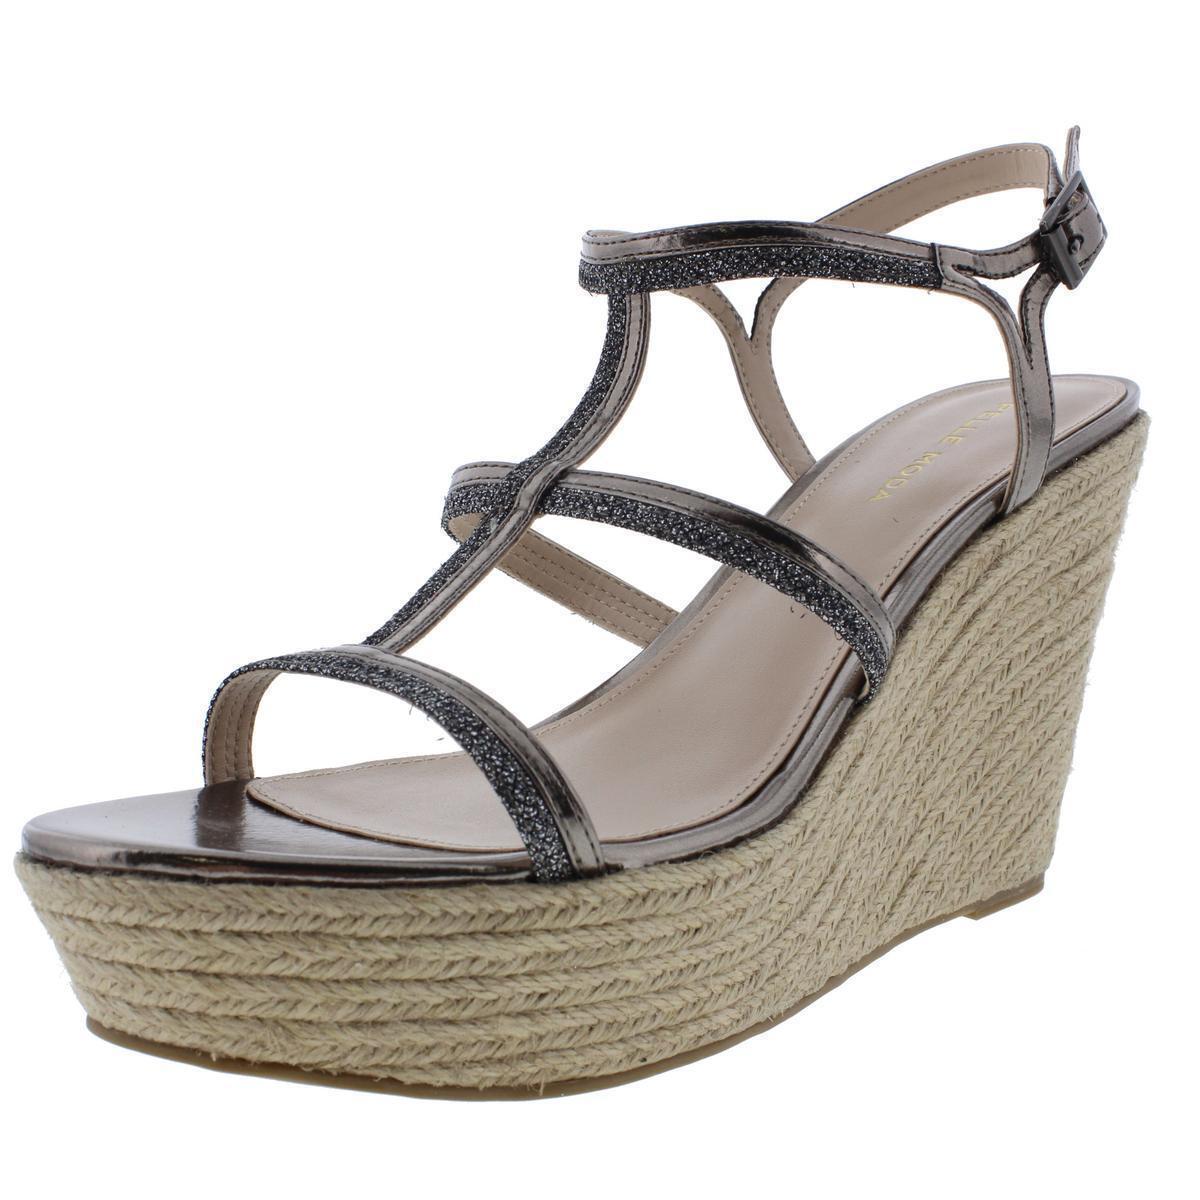 Pelle Wedge Moda Women's Cora Metallic Wedge Pelle Sandals Shoes 8.5 Medium (B,M) 10fa7b